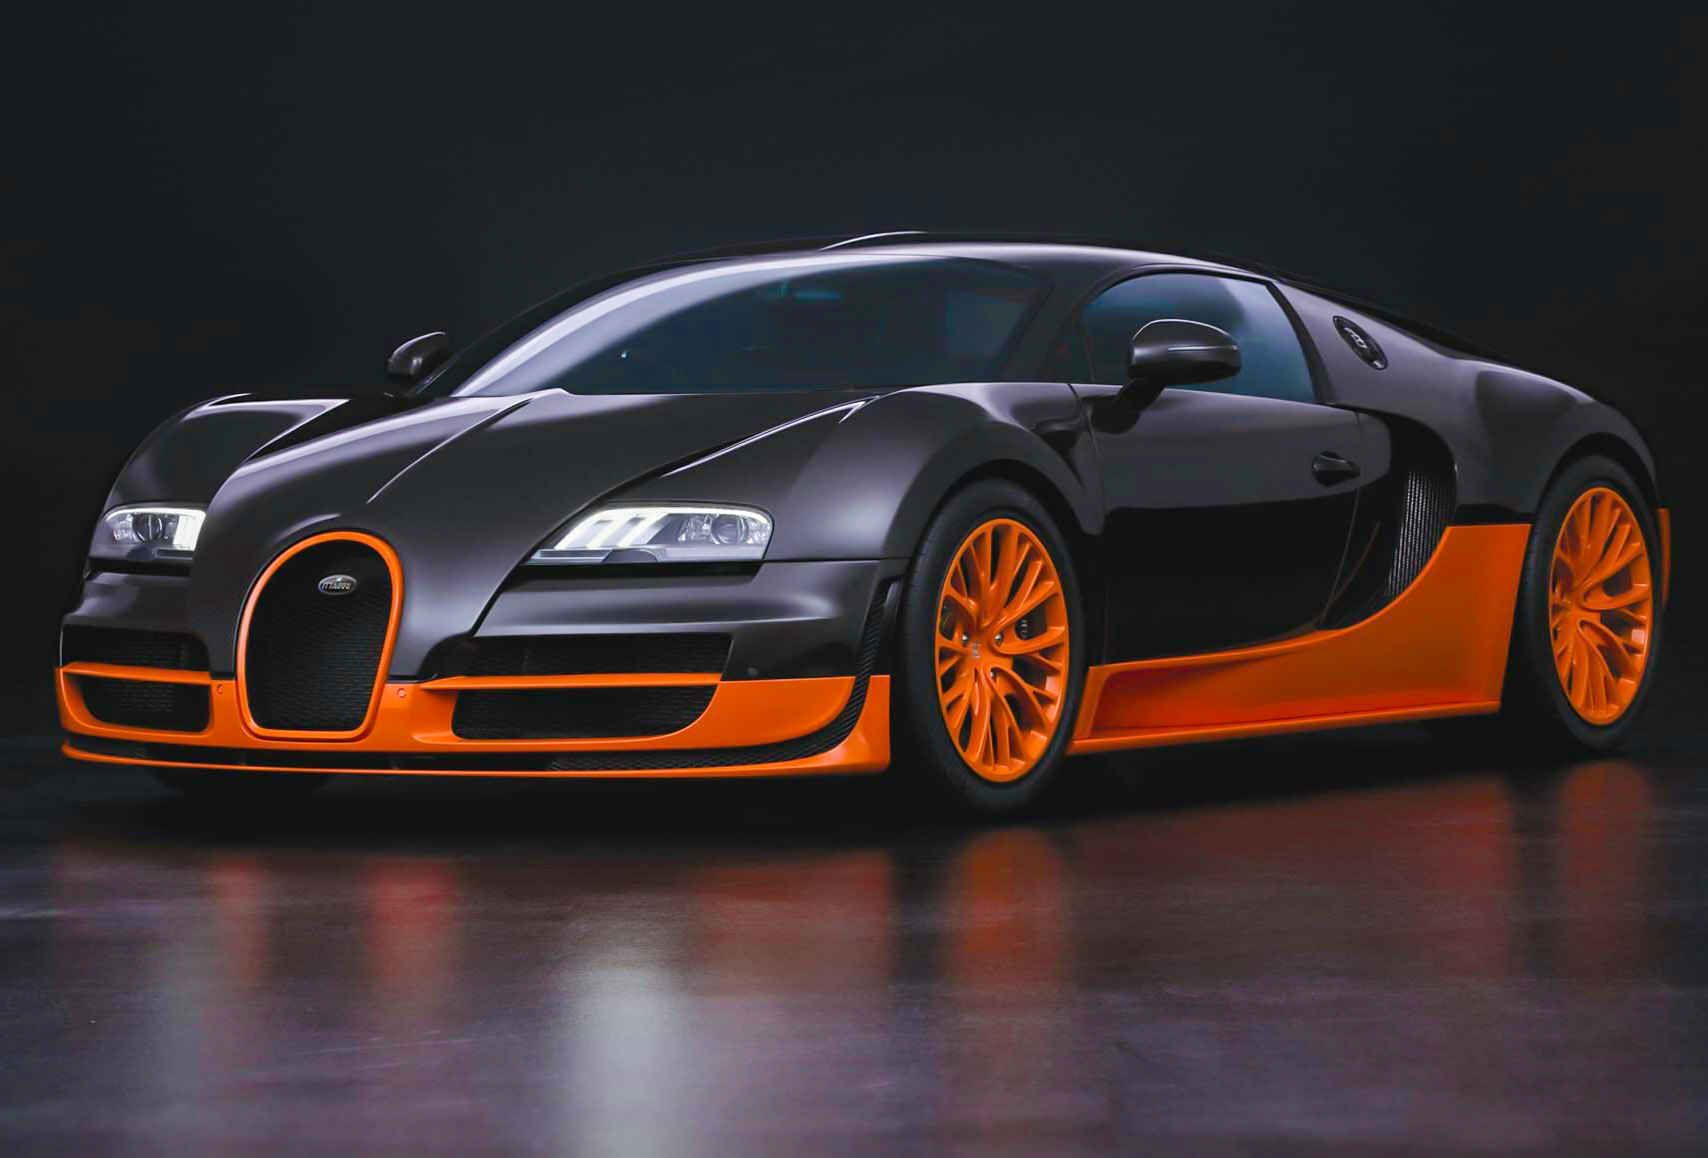 tmgslideshow_xl (1708×1158) Bugatti veyron, Bugatti